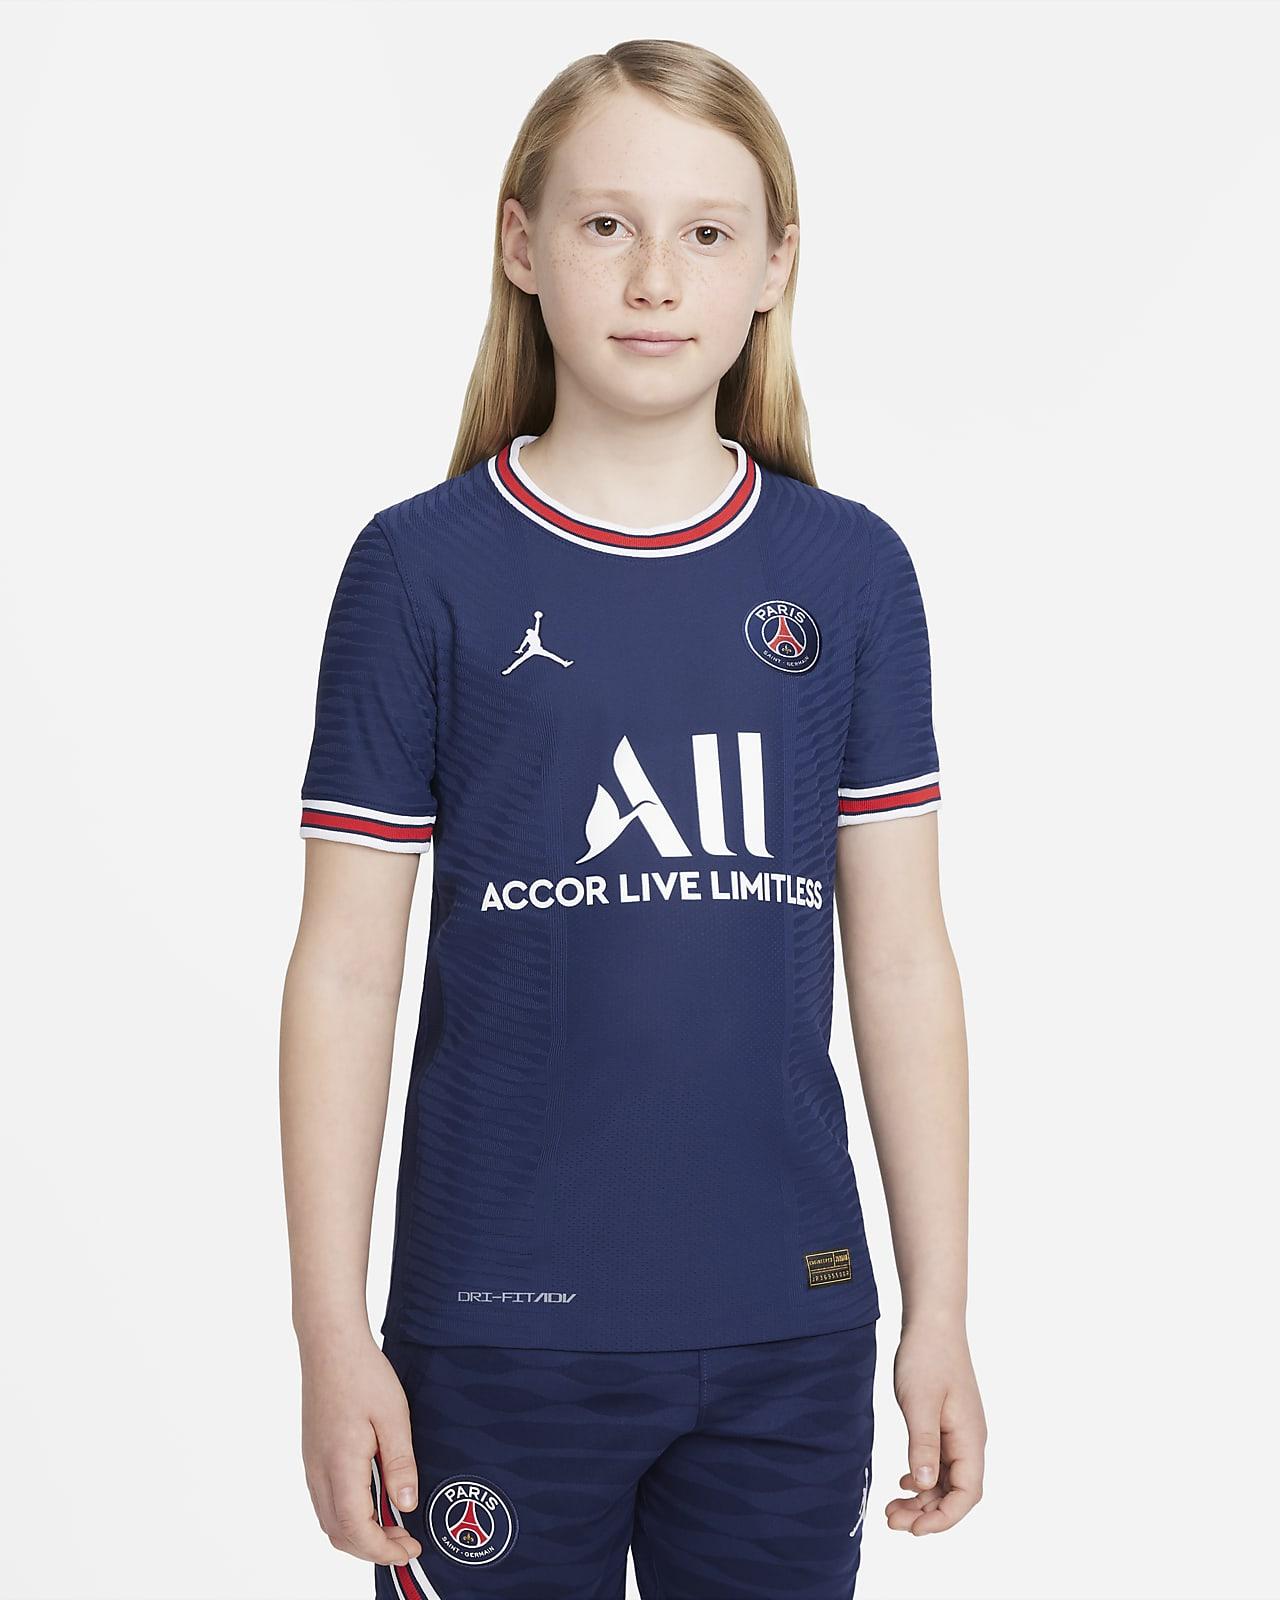 Paris Saint-Germain 2021/22 Match Home Older Kids' Nike Dri-FIT ADV Football Shirt